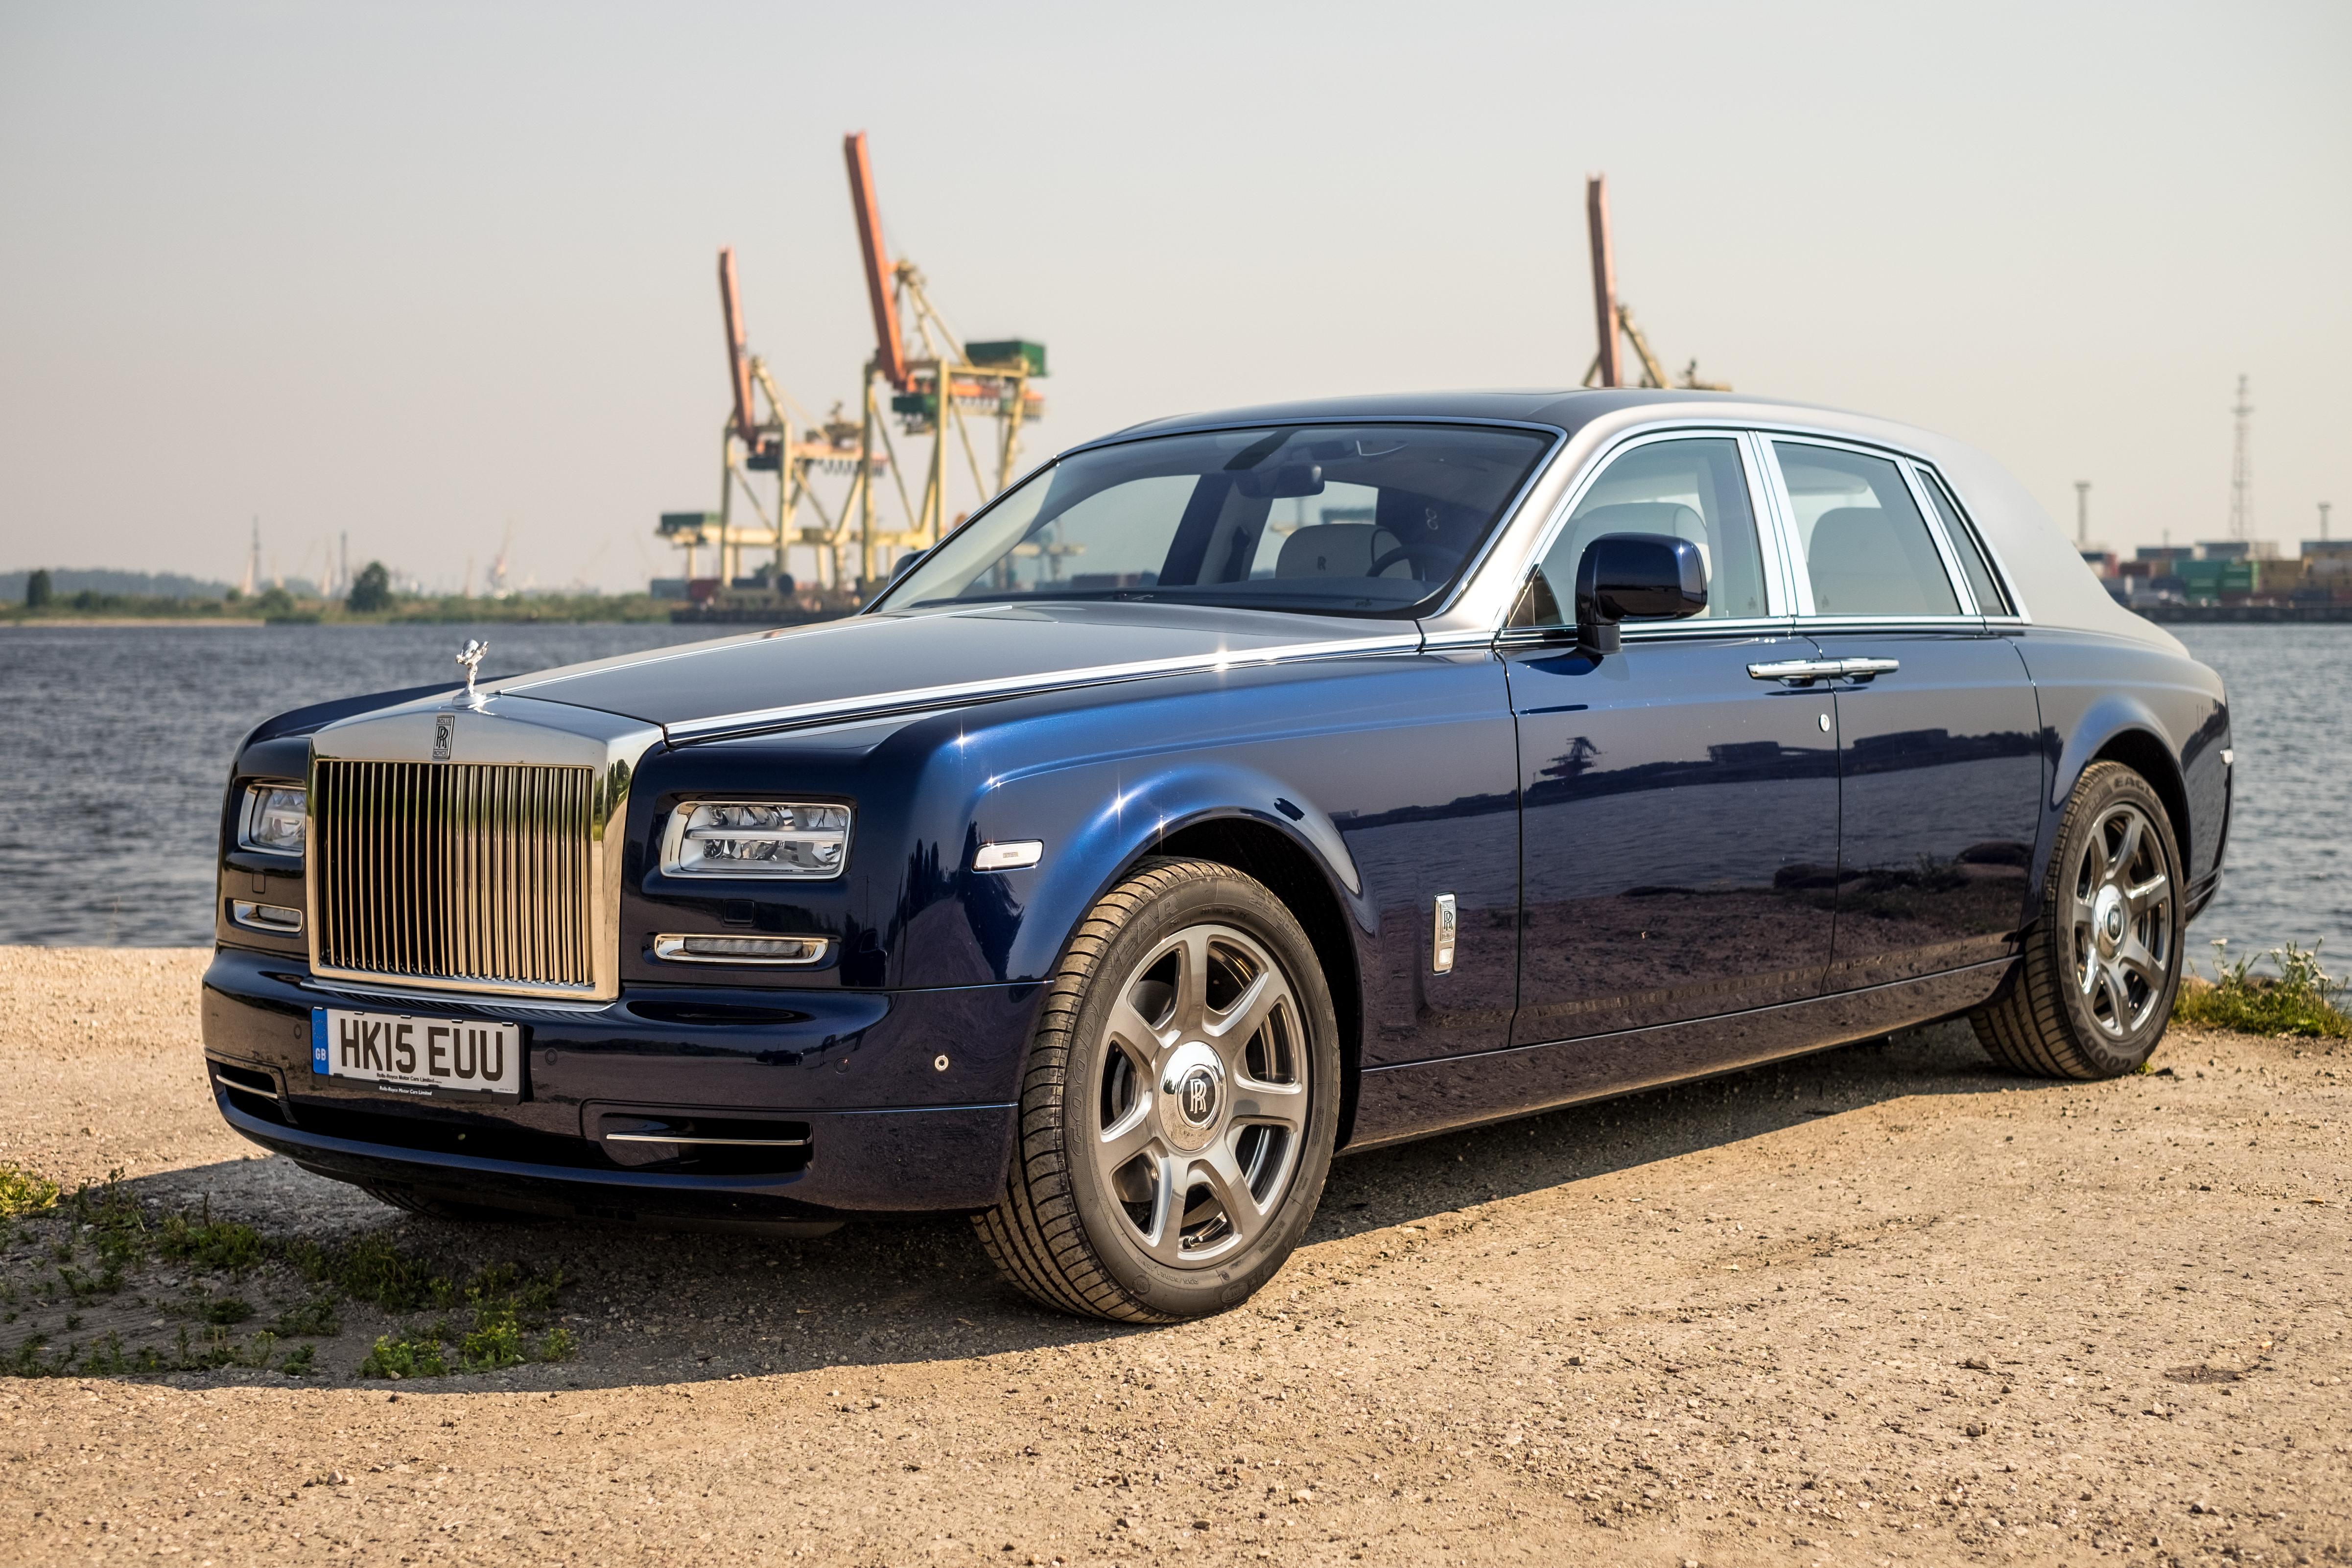 Rolls royce motor cars wikiwand for Rolls royce motor cars